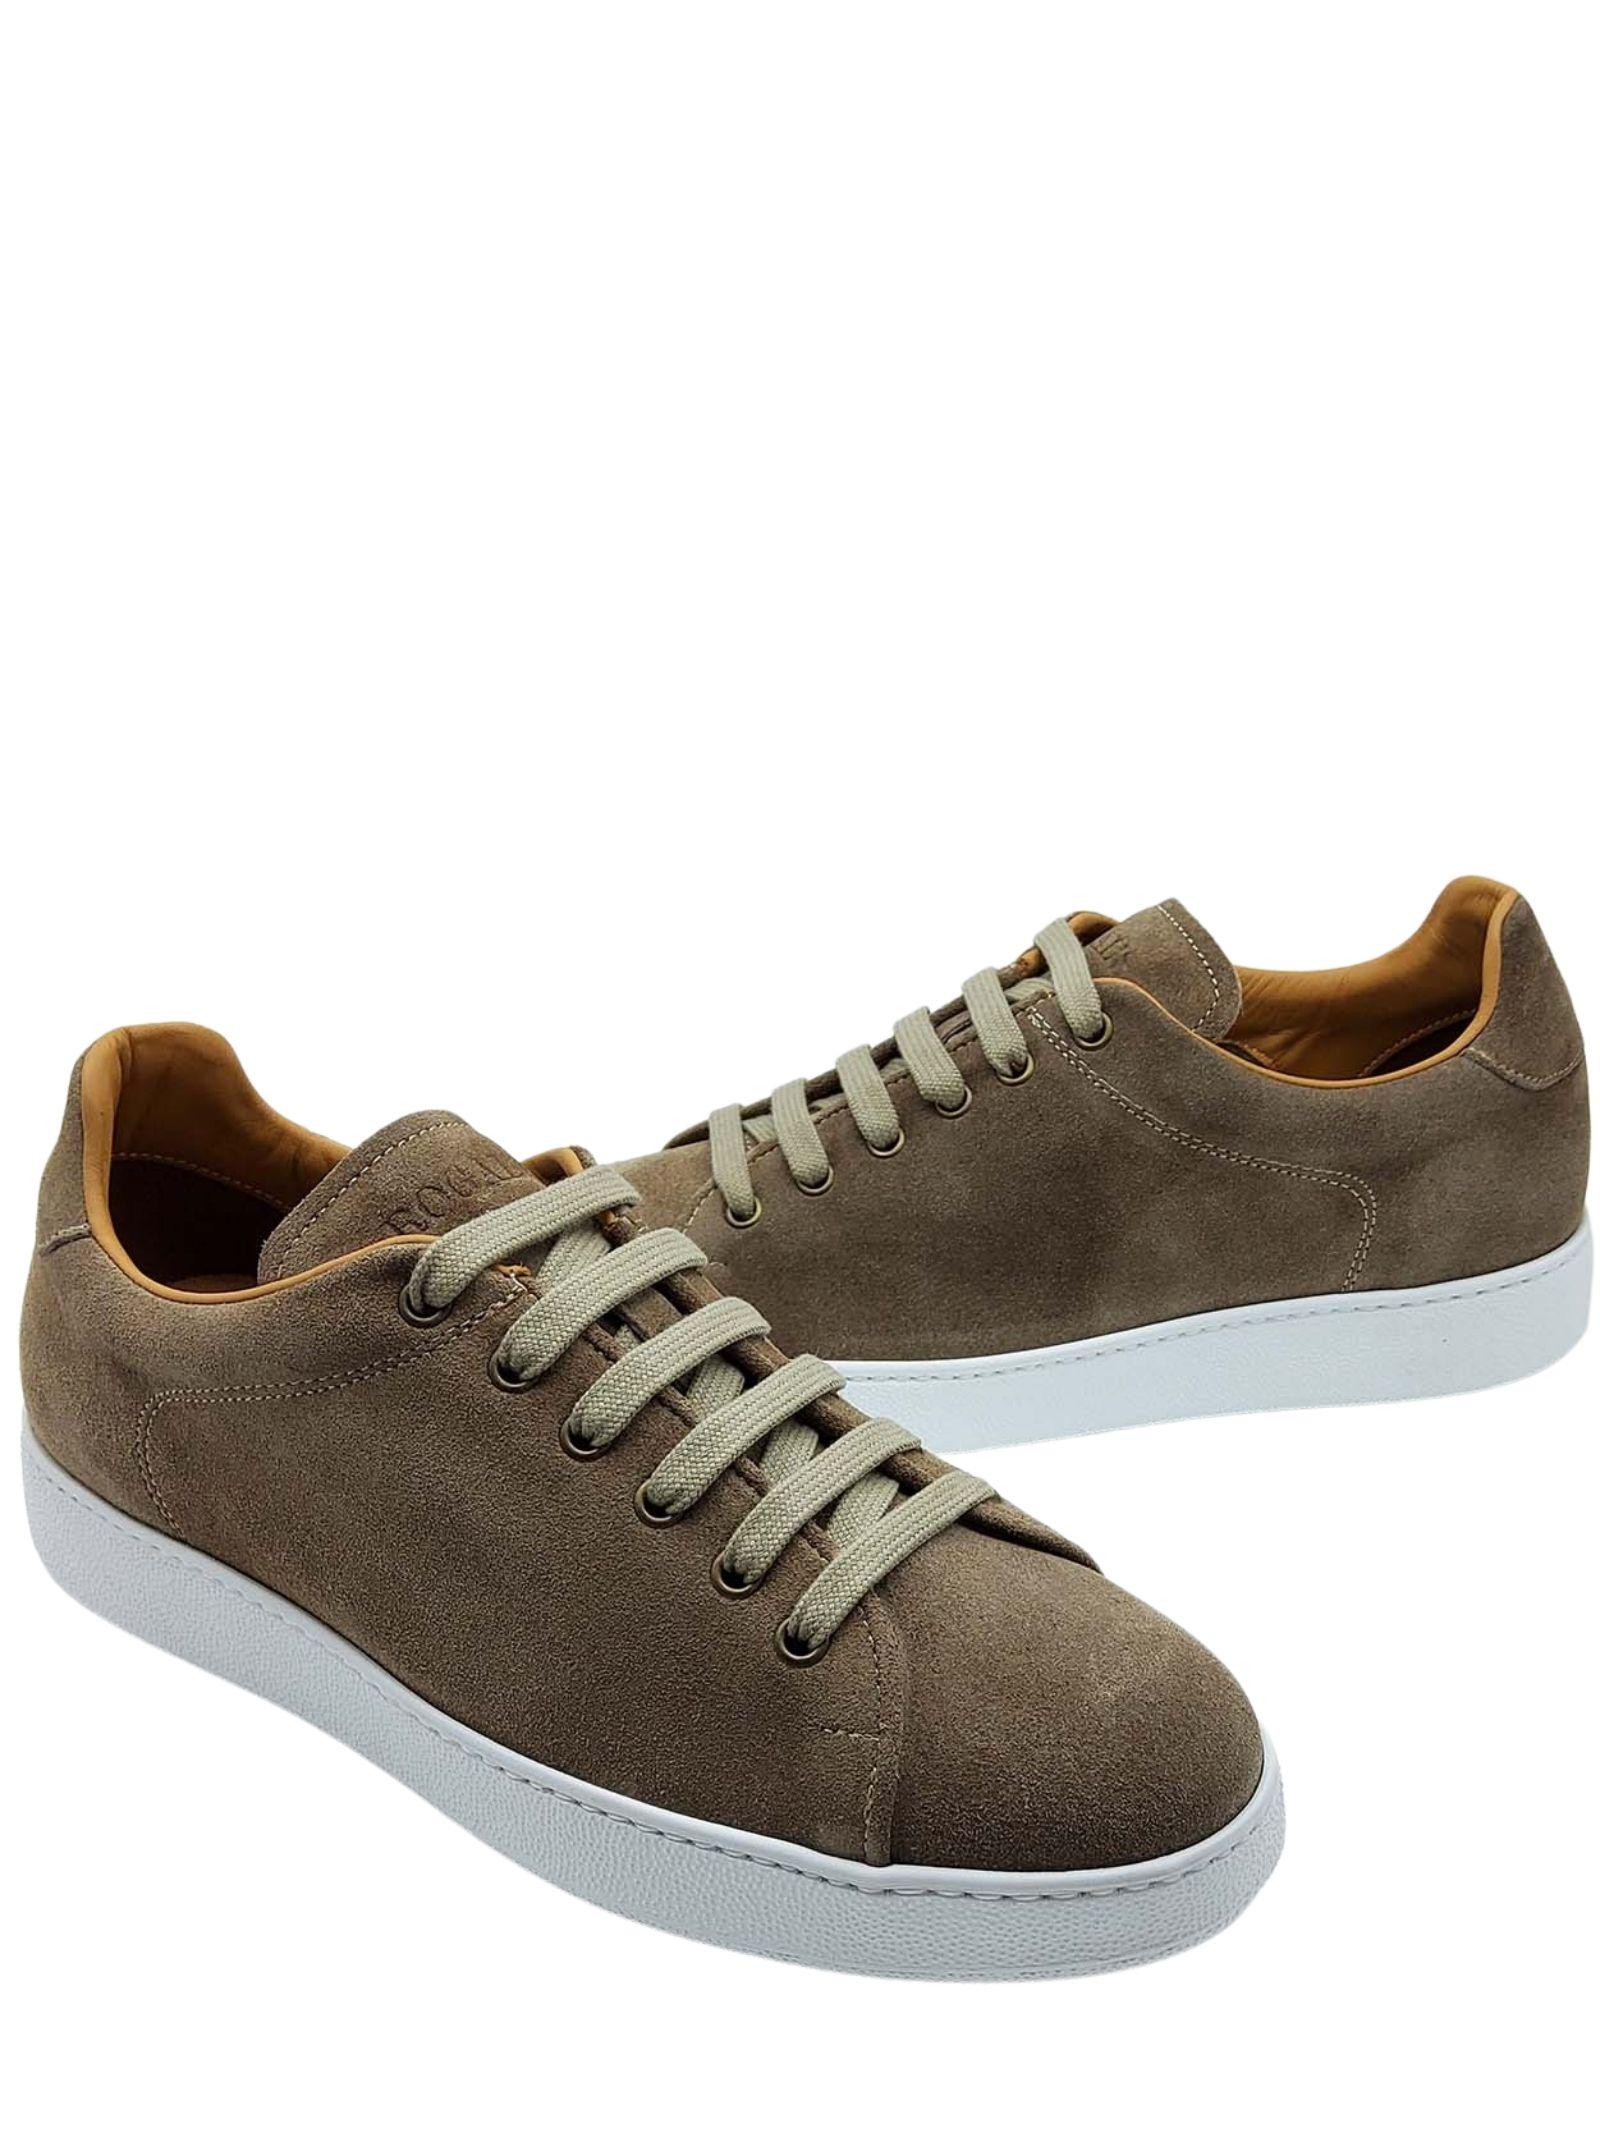 Calzature Uomo Sneakers Stringate in Camoscio Taupe Fodera in Pelle e Fondo Gomma Bianco Rogal's | Sneakers | MUR1023